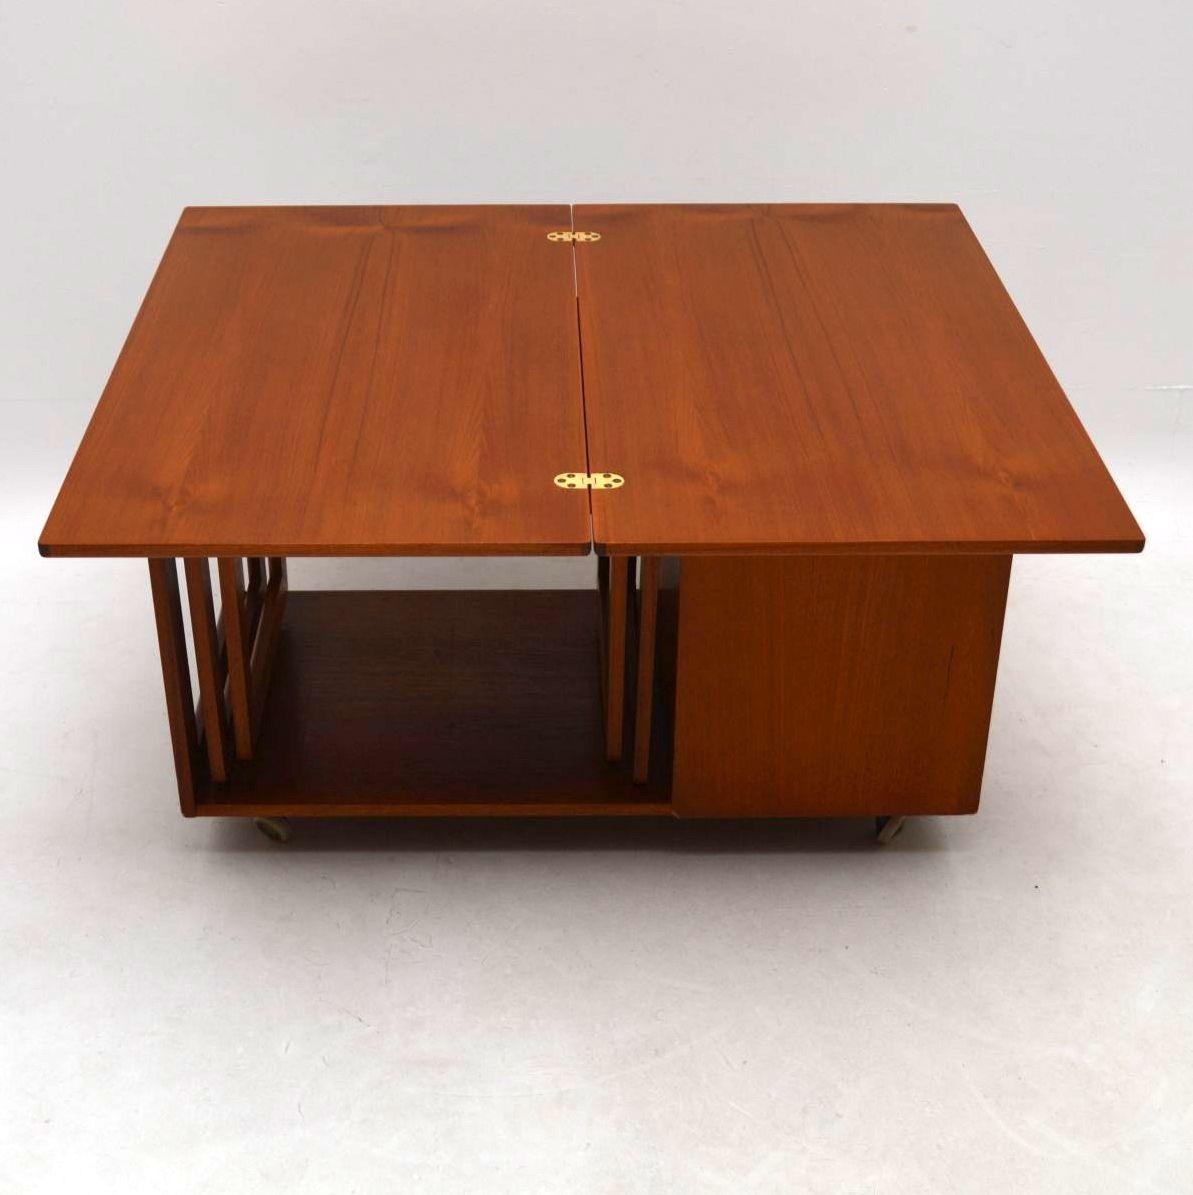 1960 S Teak Tristor Coffee Table By Mcintosh Retrospective Interiors